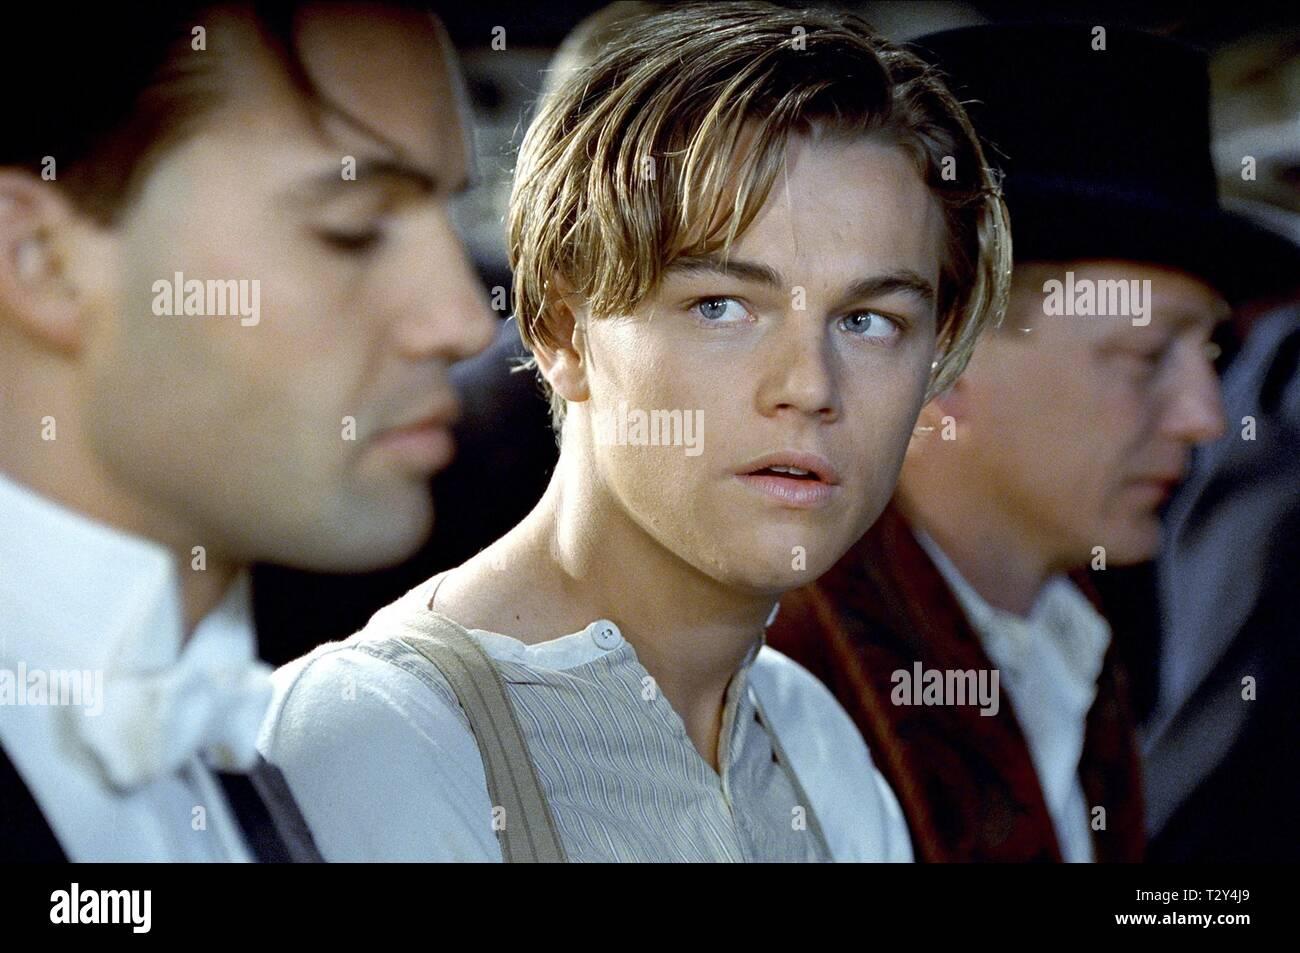 Billy Zane Leonardo Dicaprio Titanic 1997 Stock Photo Alamy